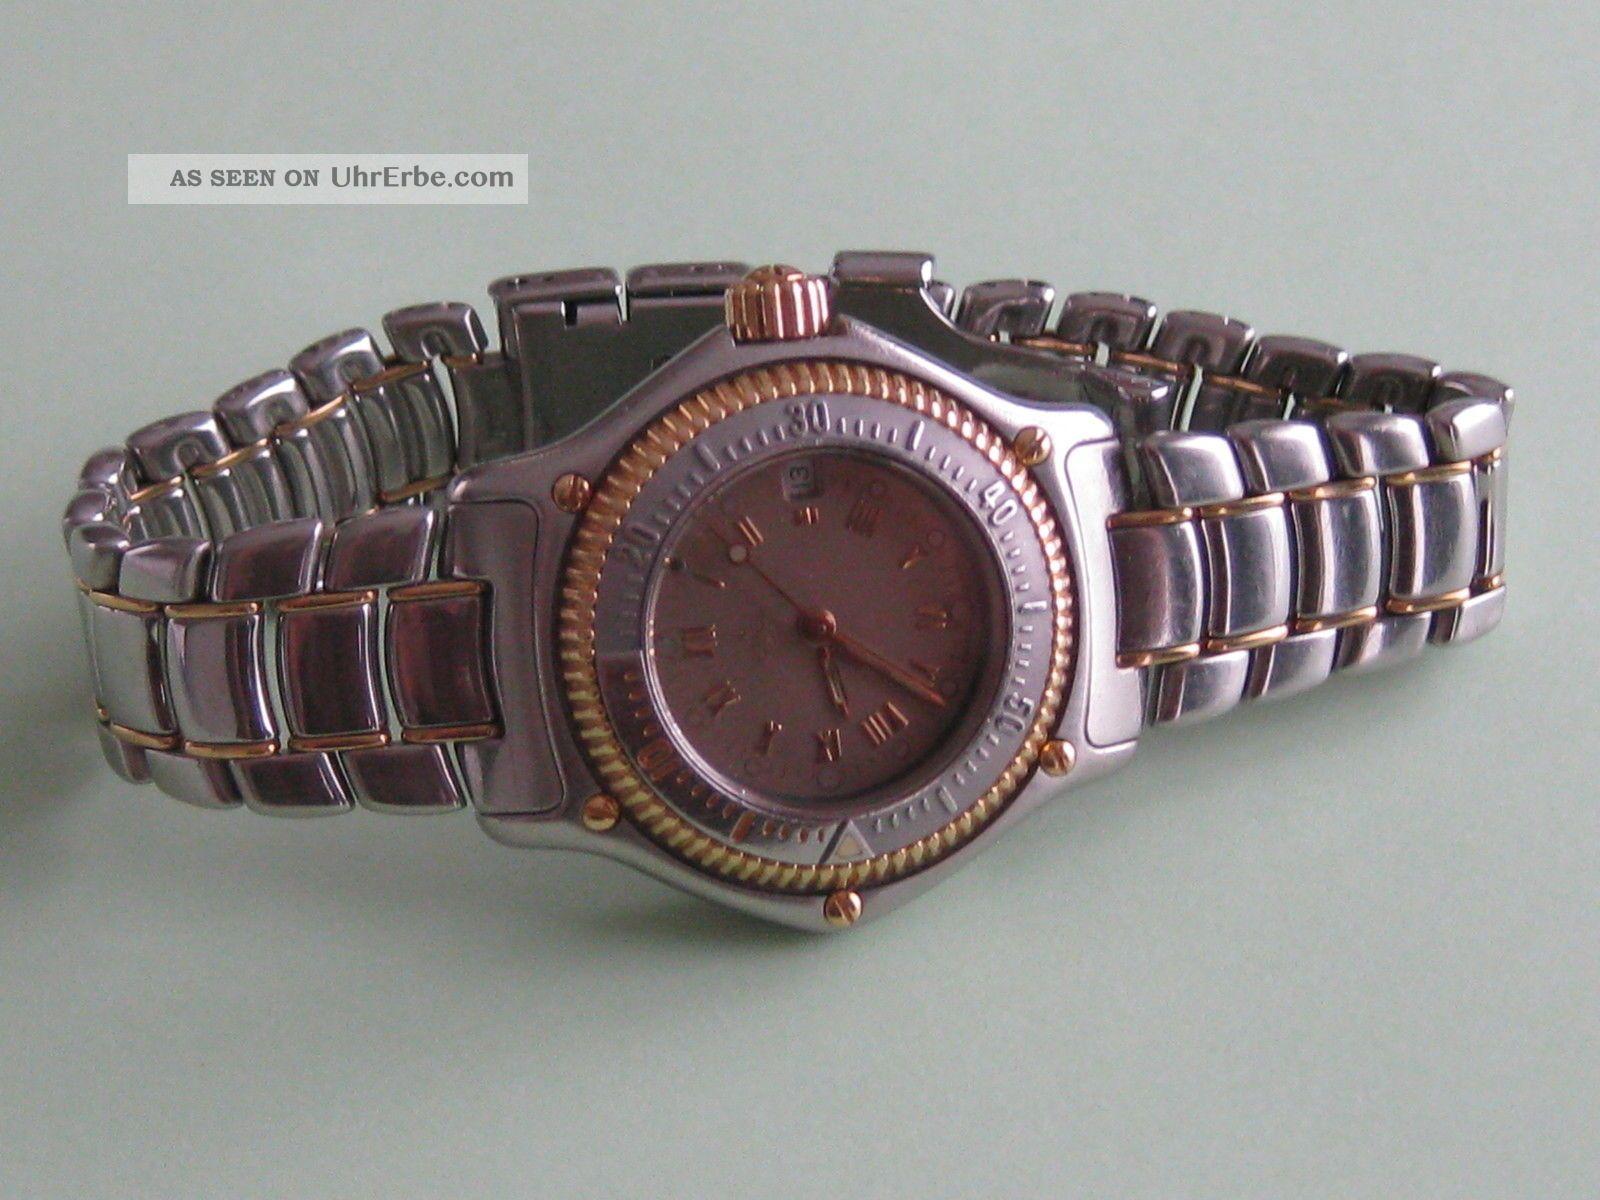 Ebel Discovery Divers - Steel/18k Gold Damenuhr Armbanduhren Bild